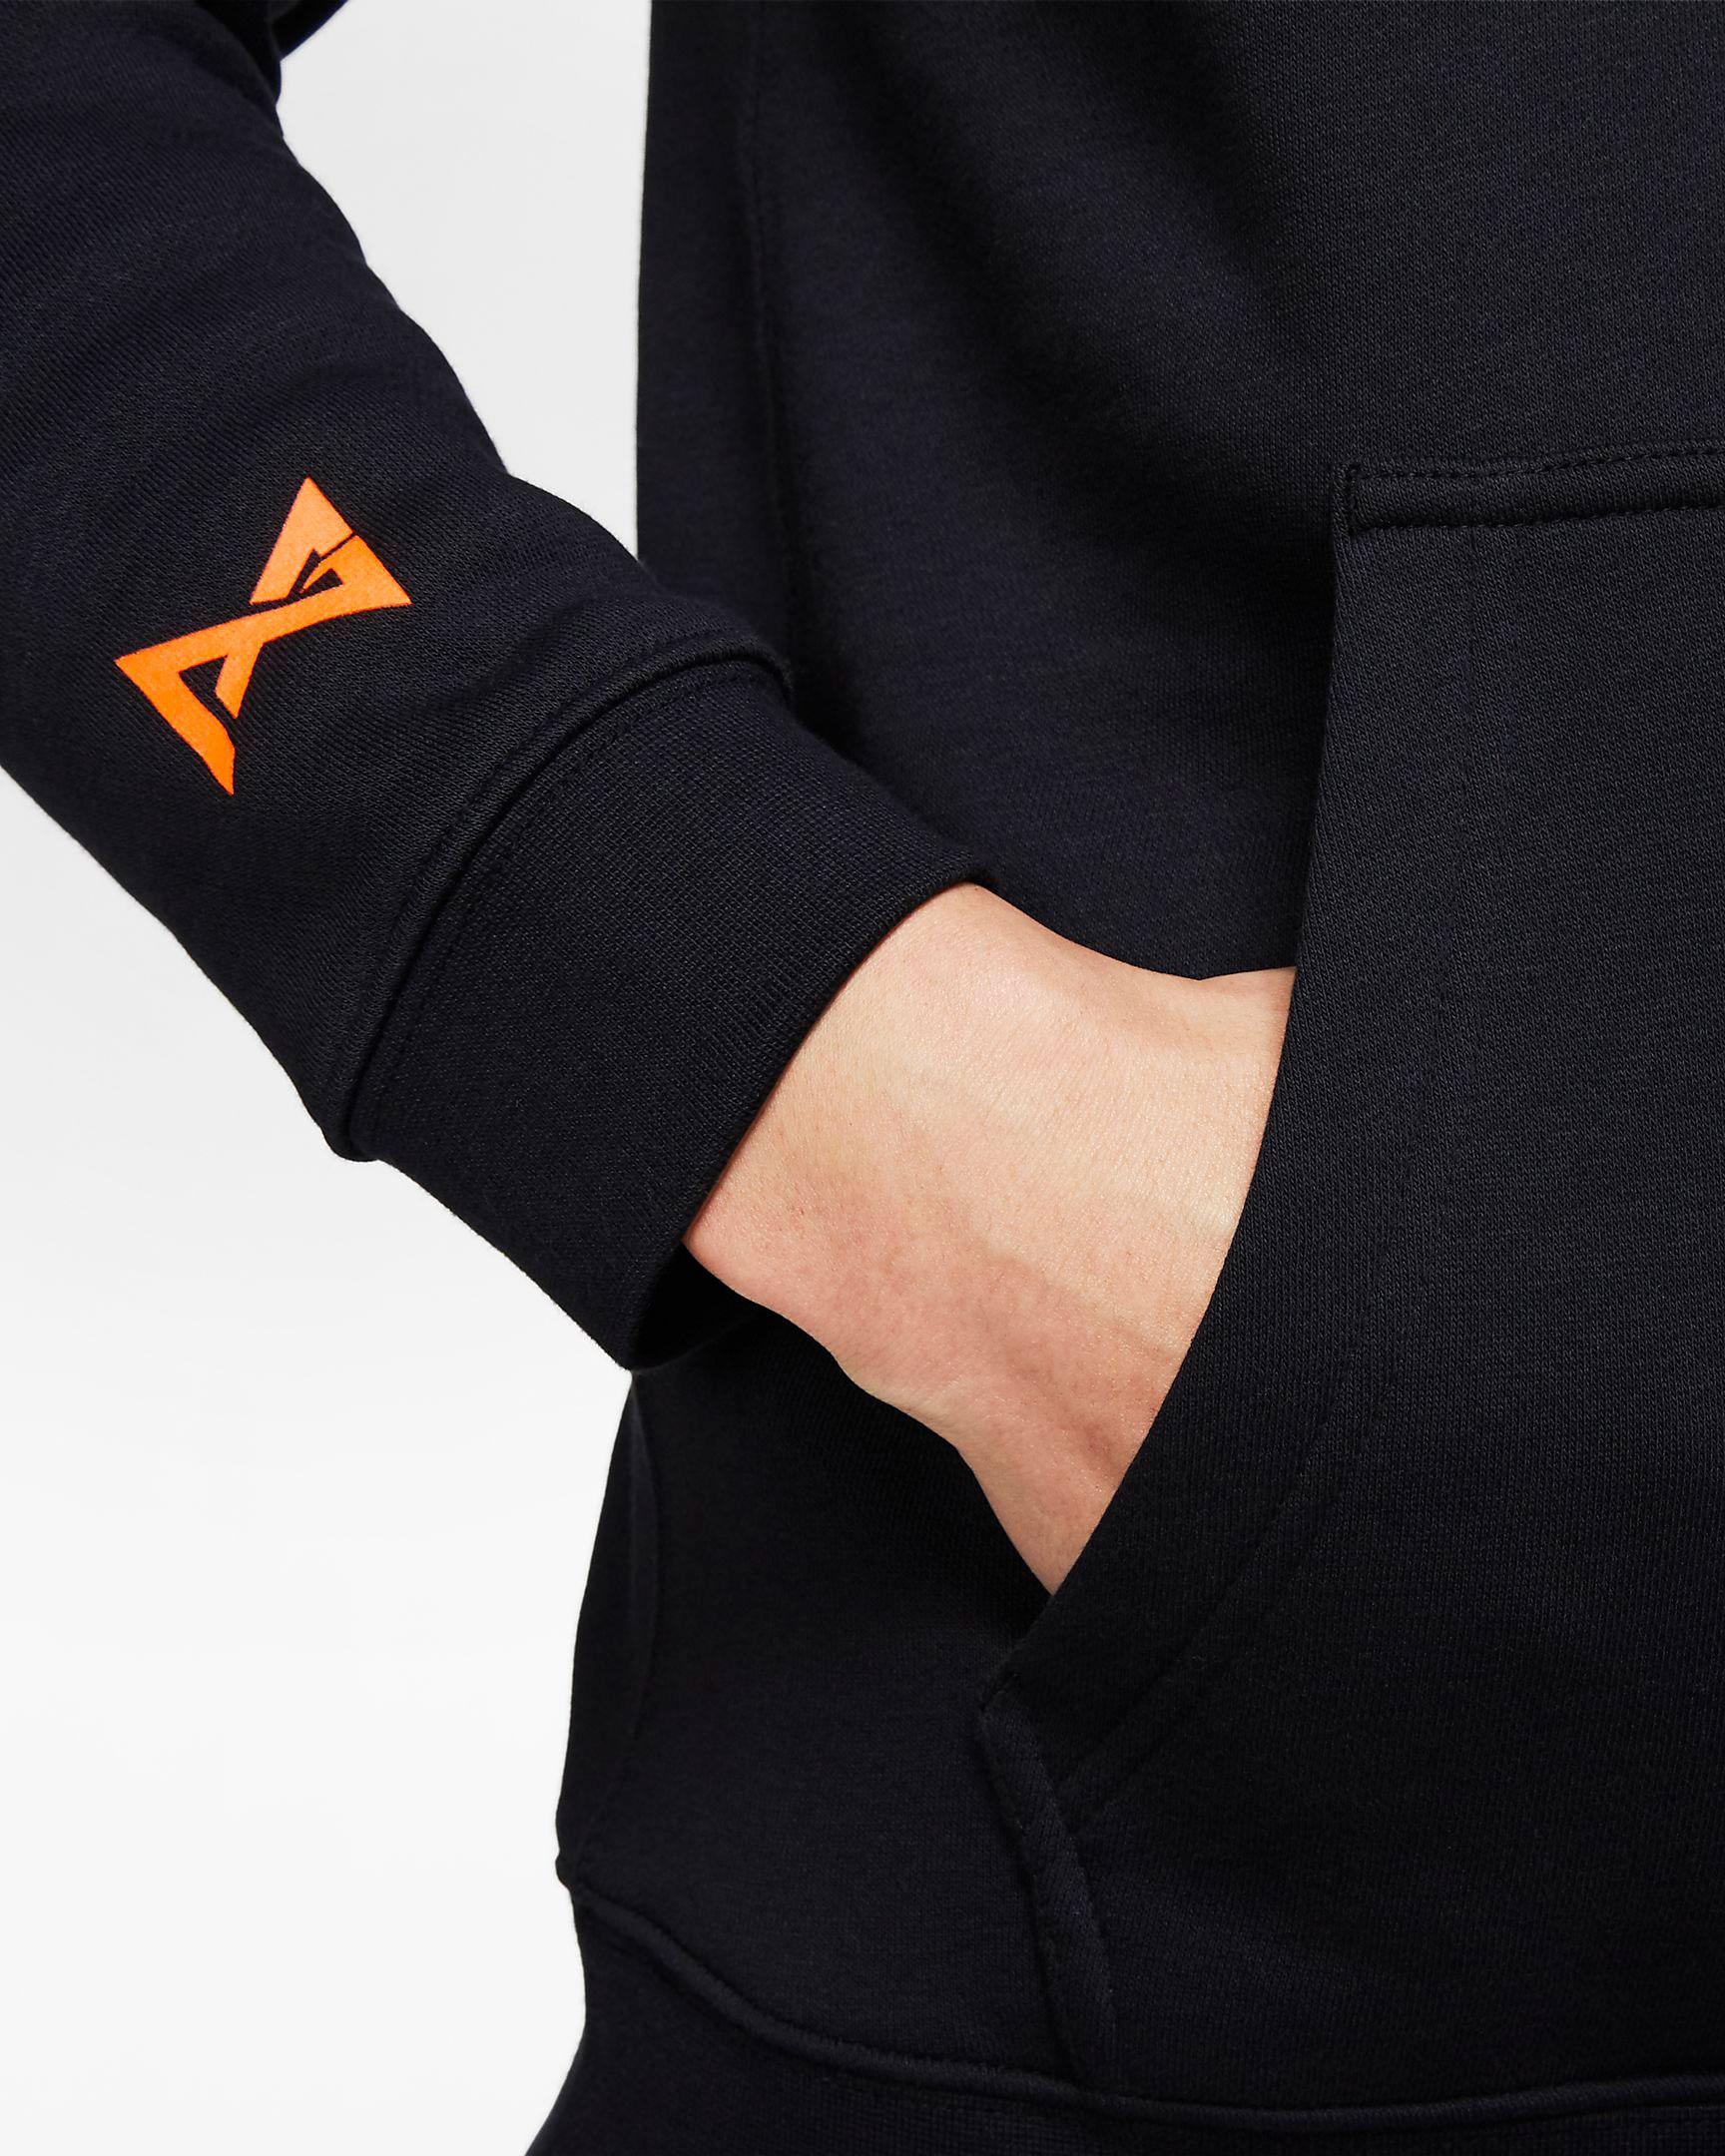 nike-pg-4-gatorade-all-star-hoodie-5